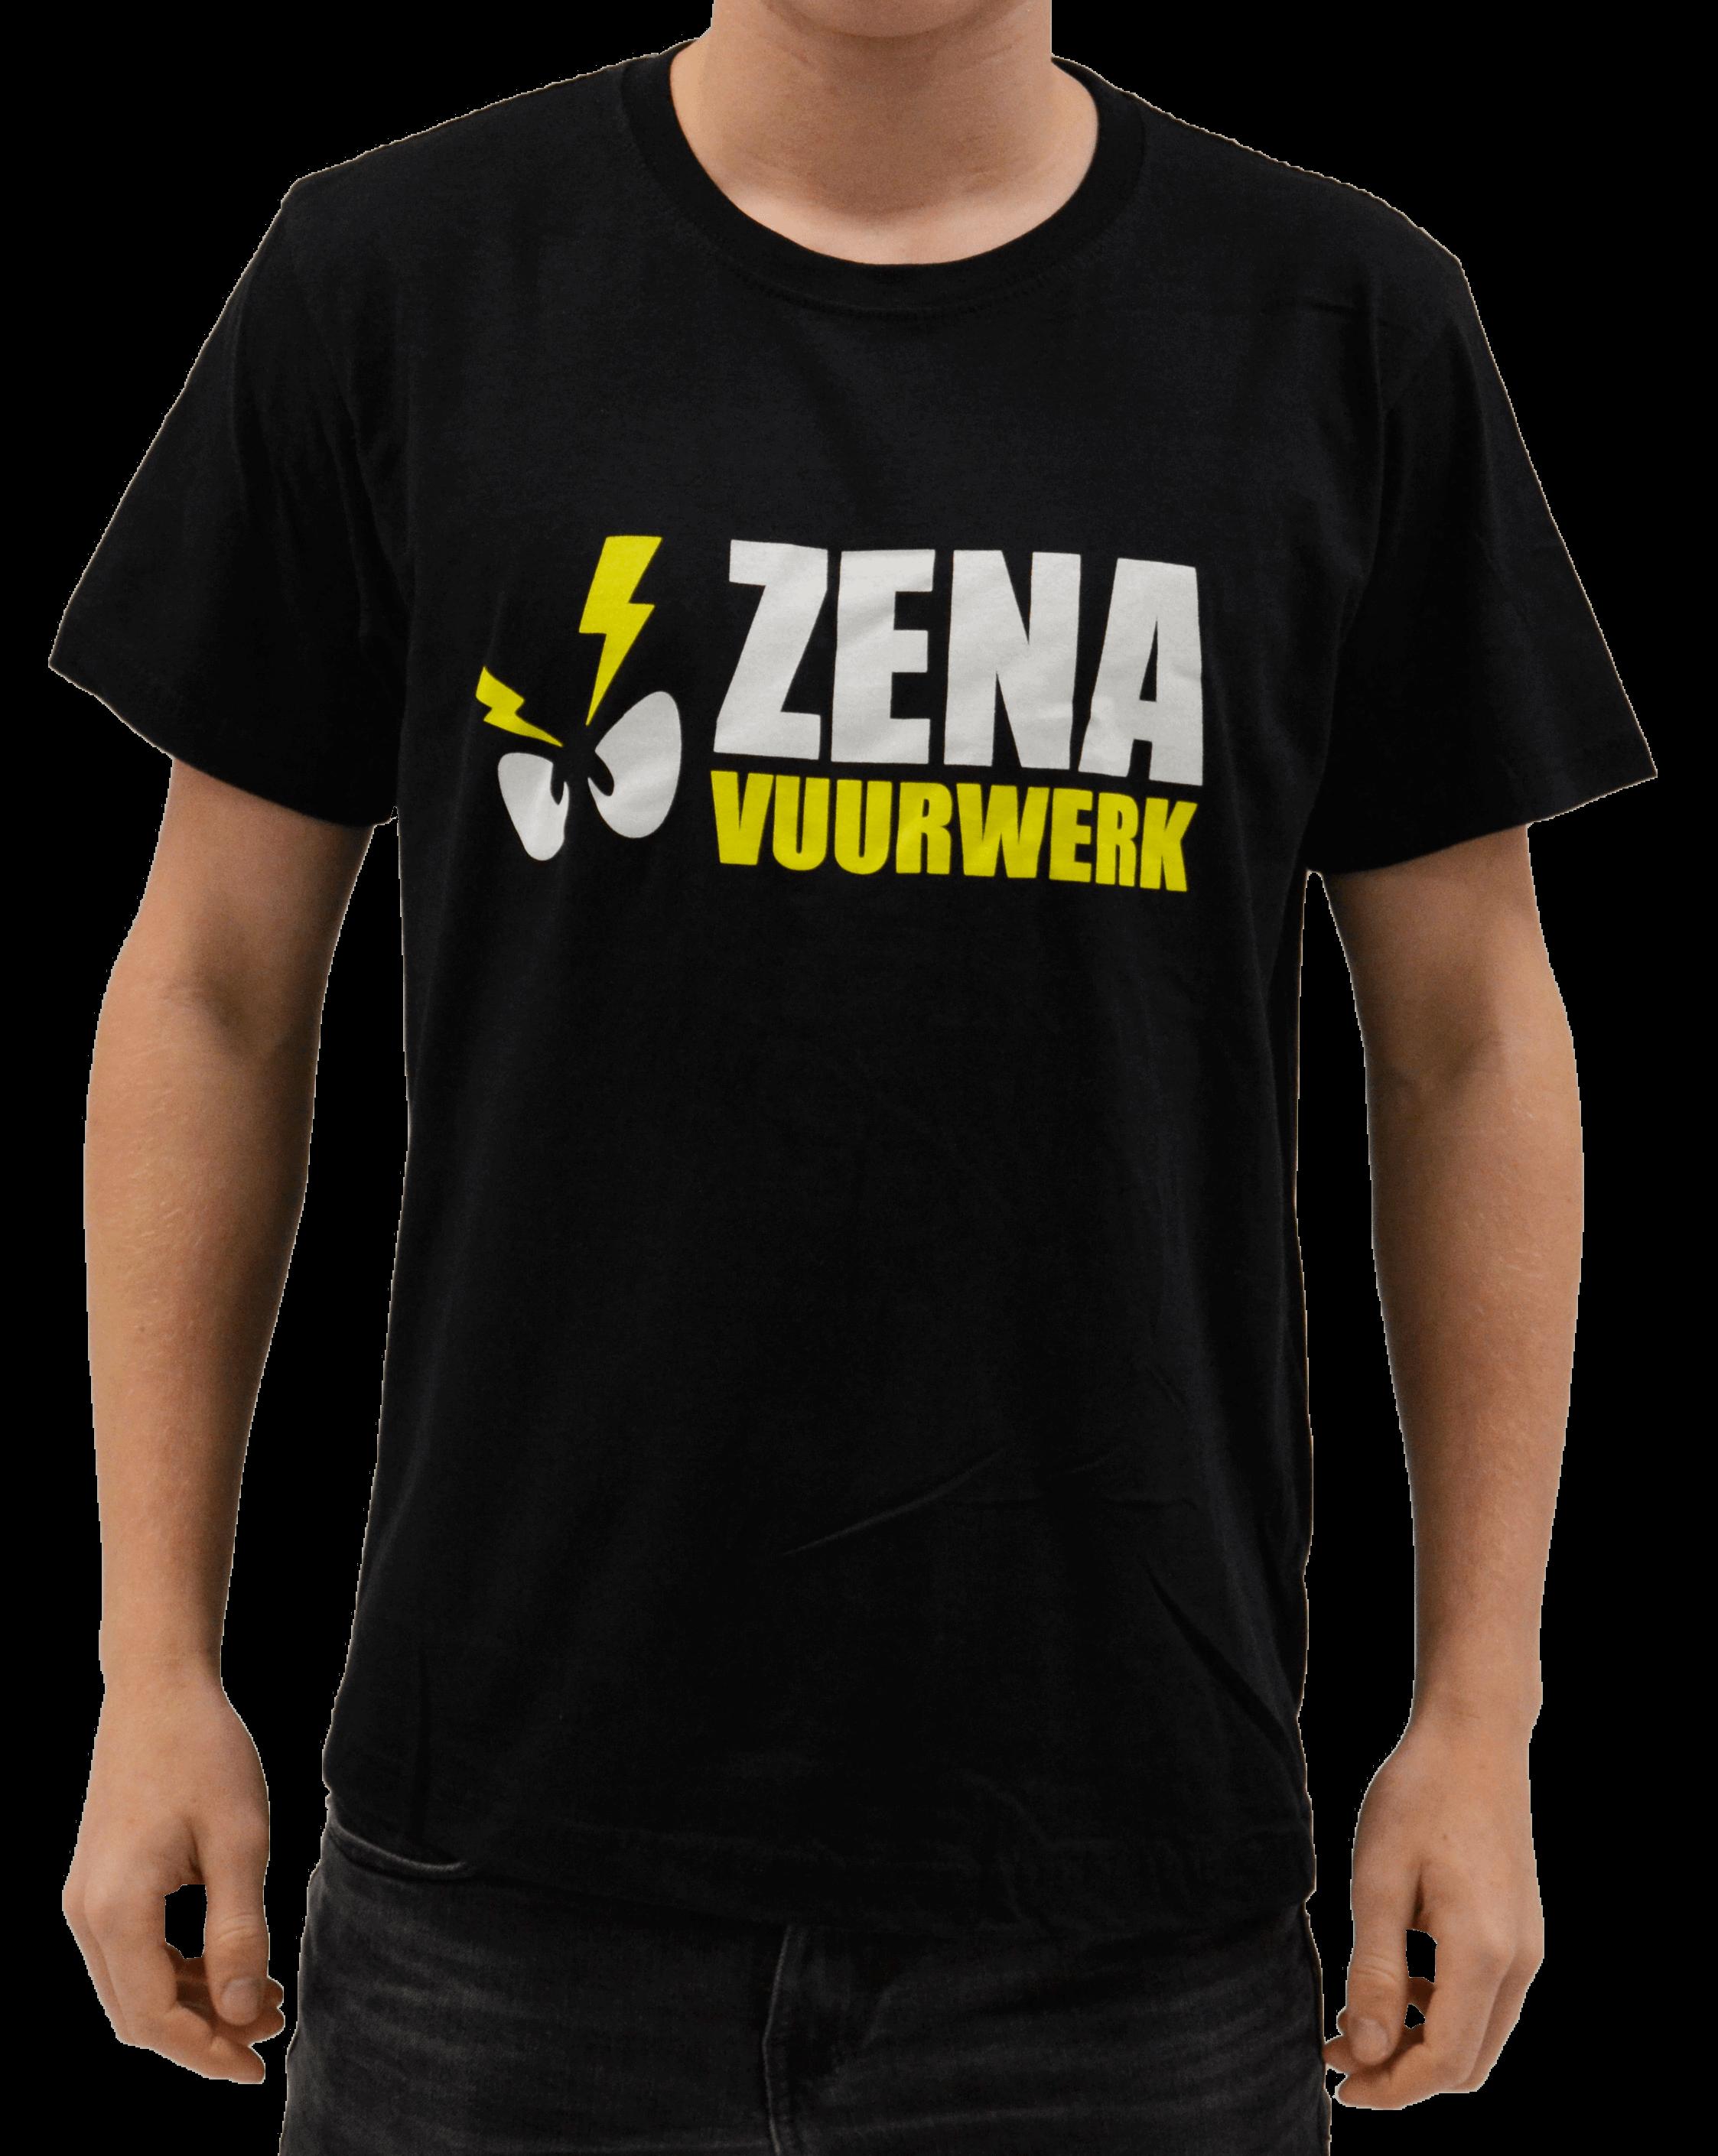 Zena T-Shirt Maat XL